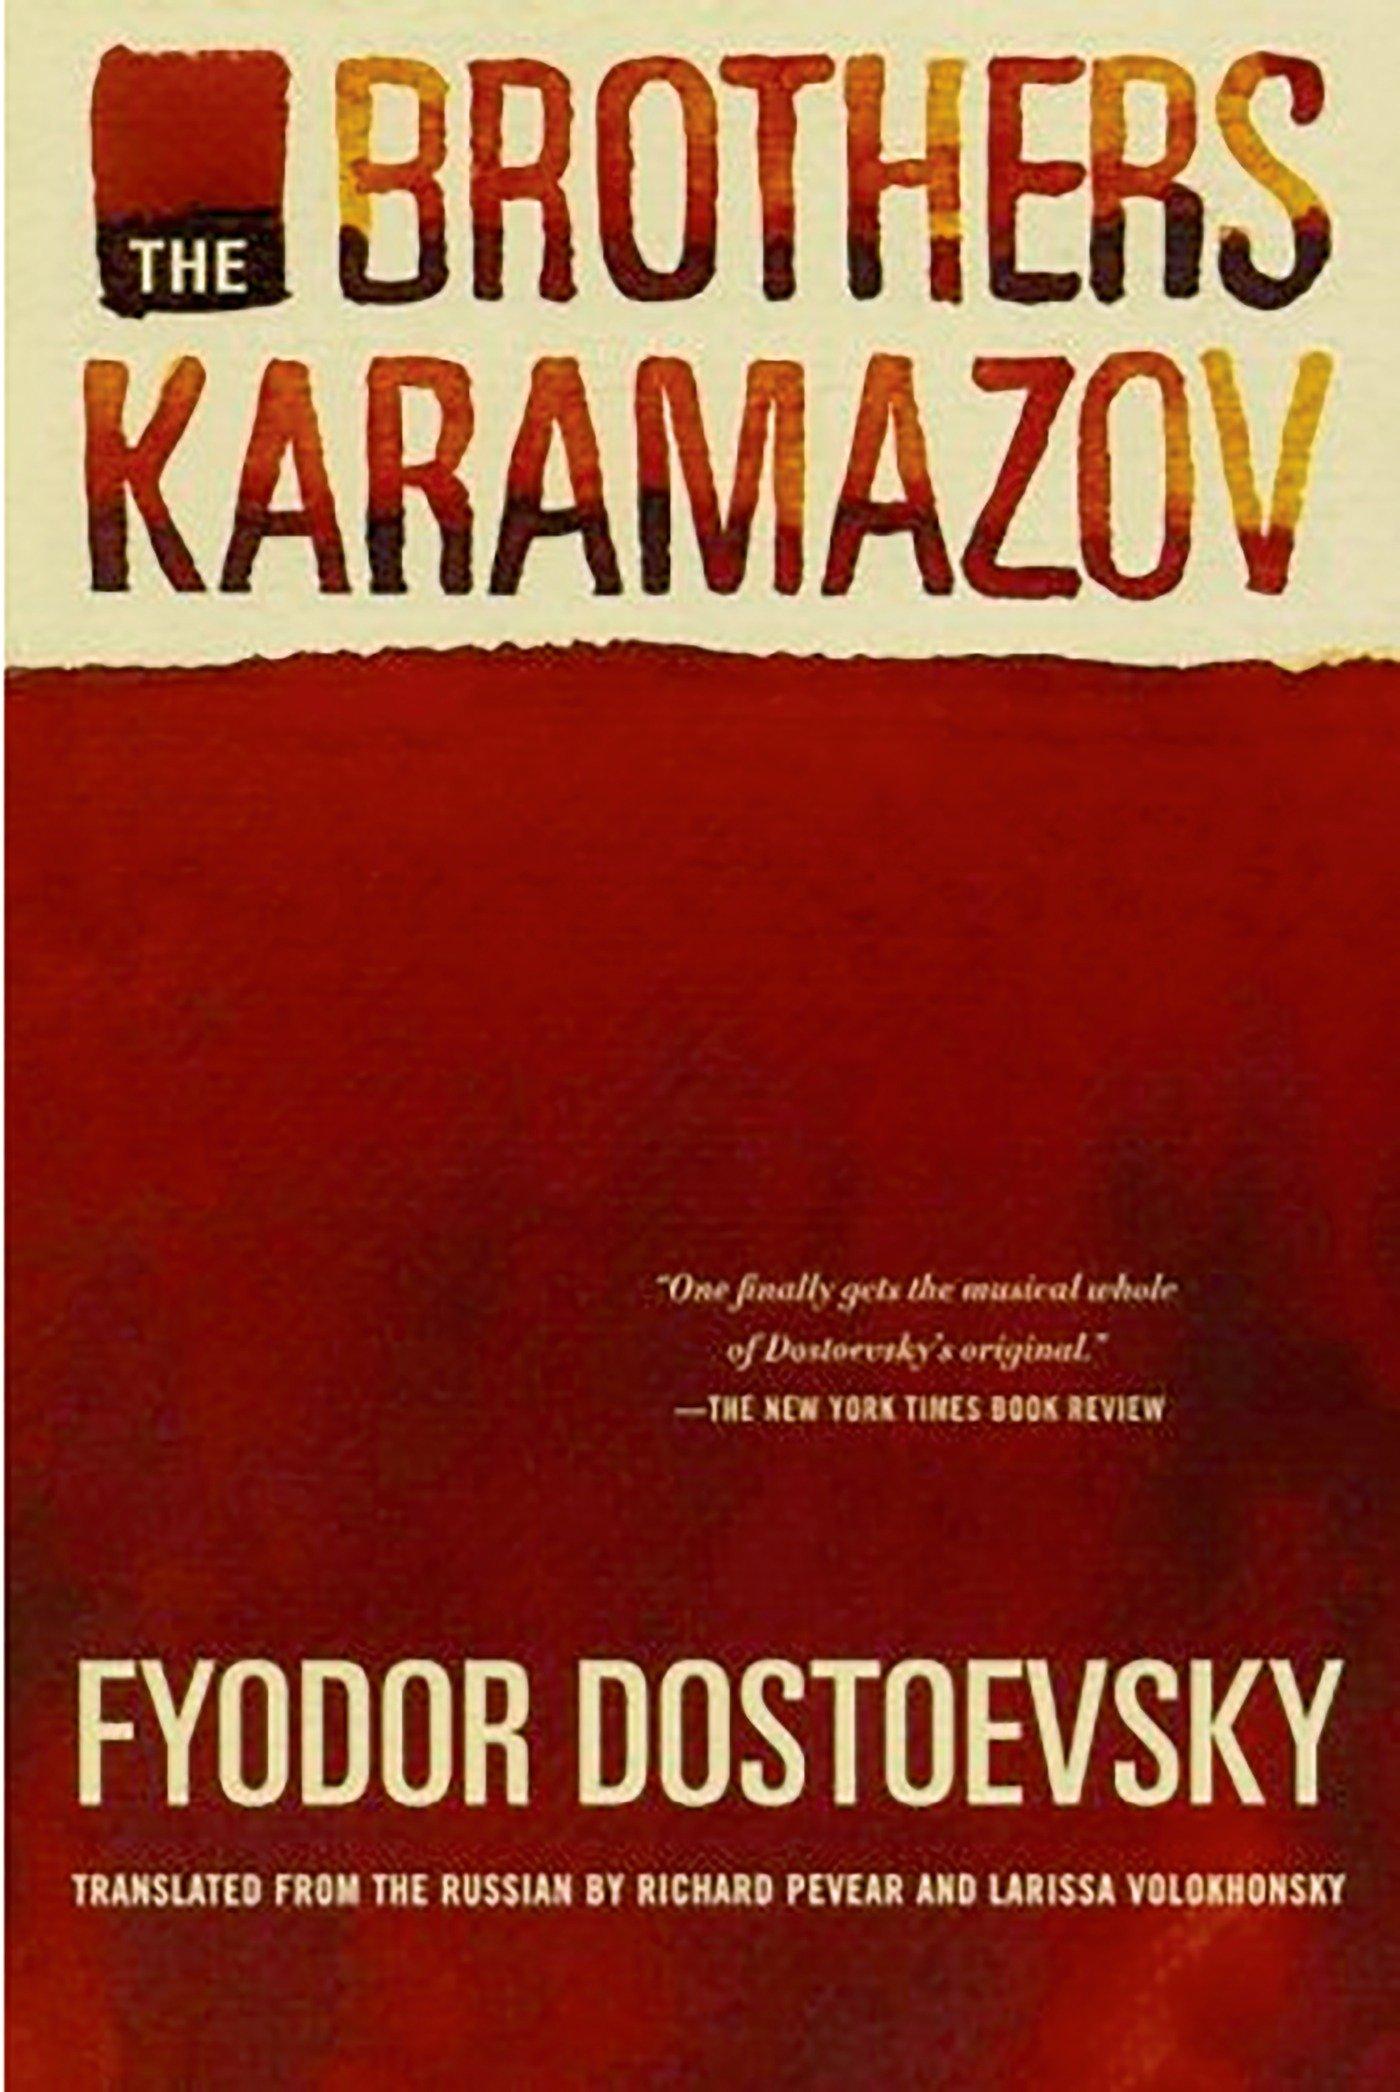 Brothers Karamazov.jpg